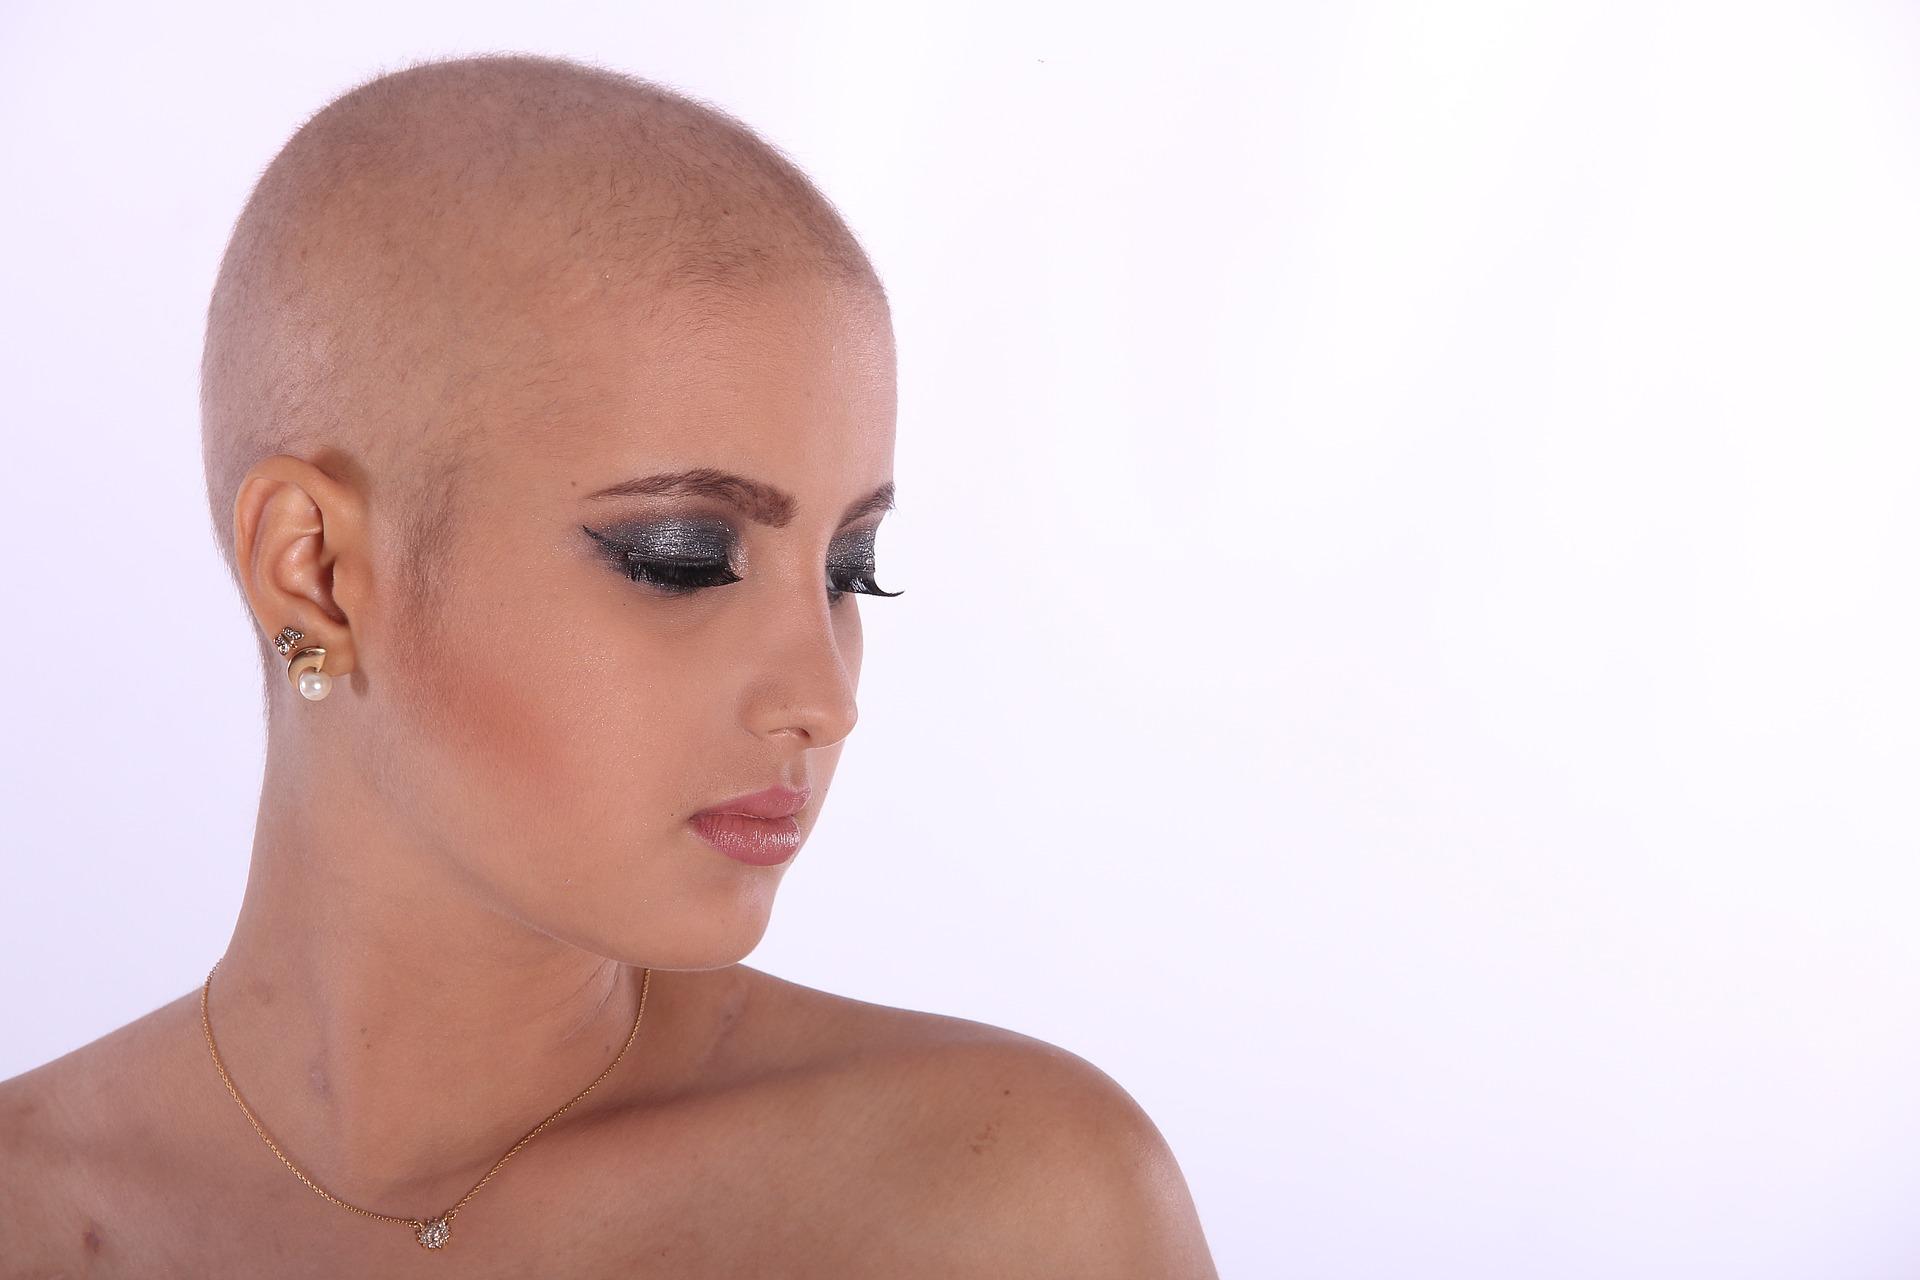 Alternative Treatments To Cancer Do Exist